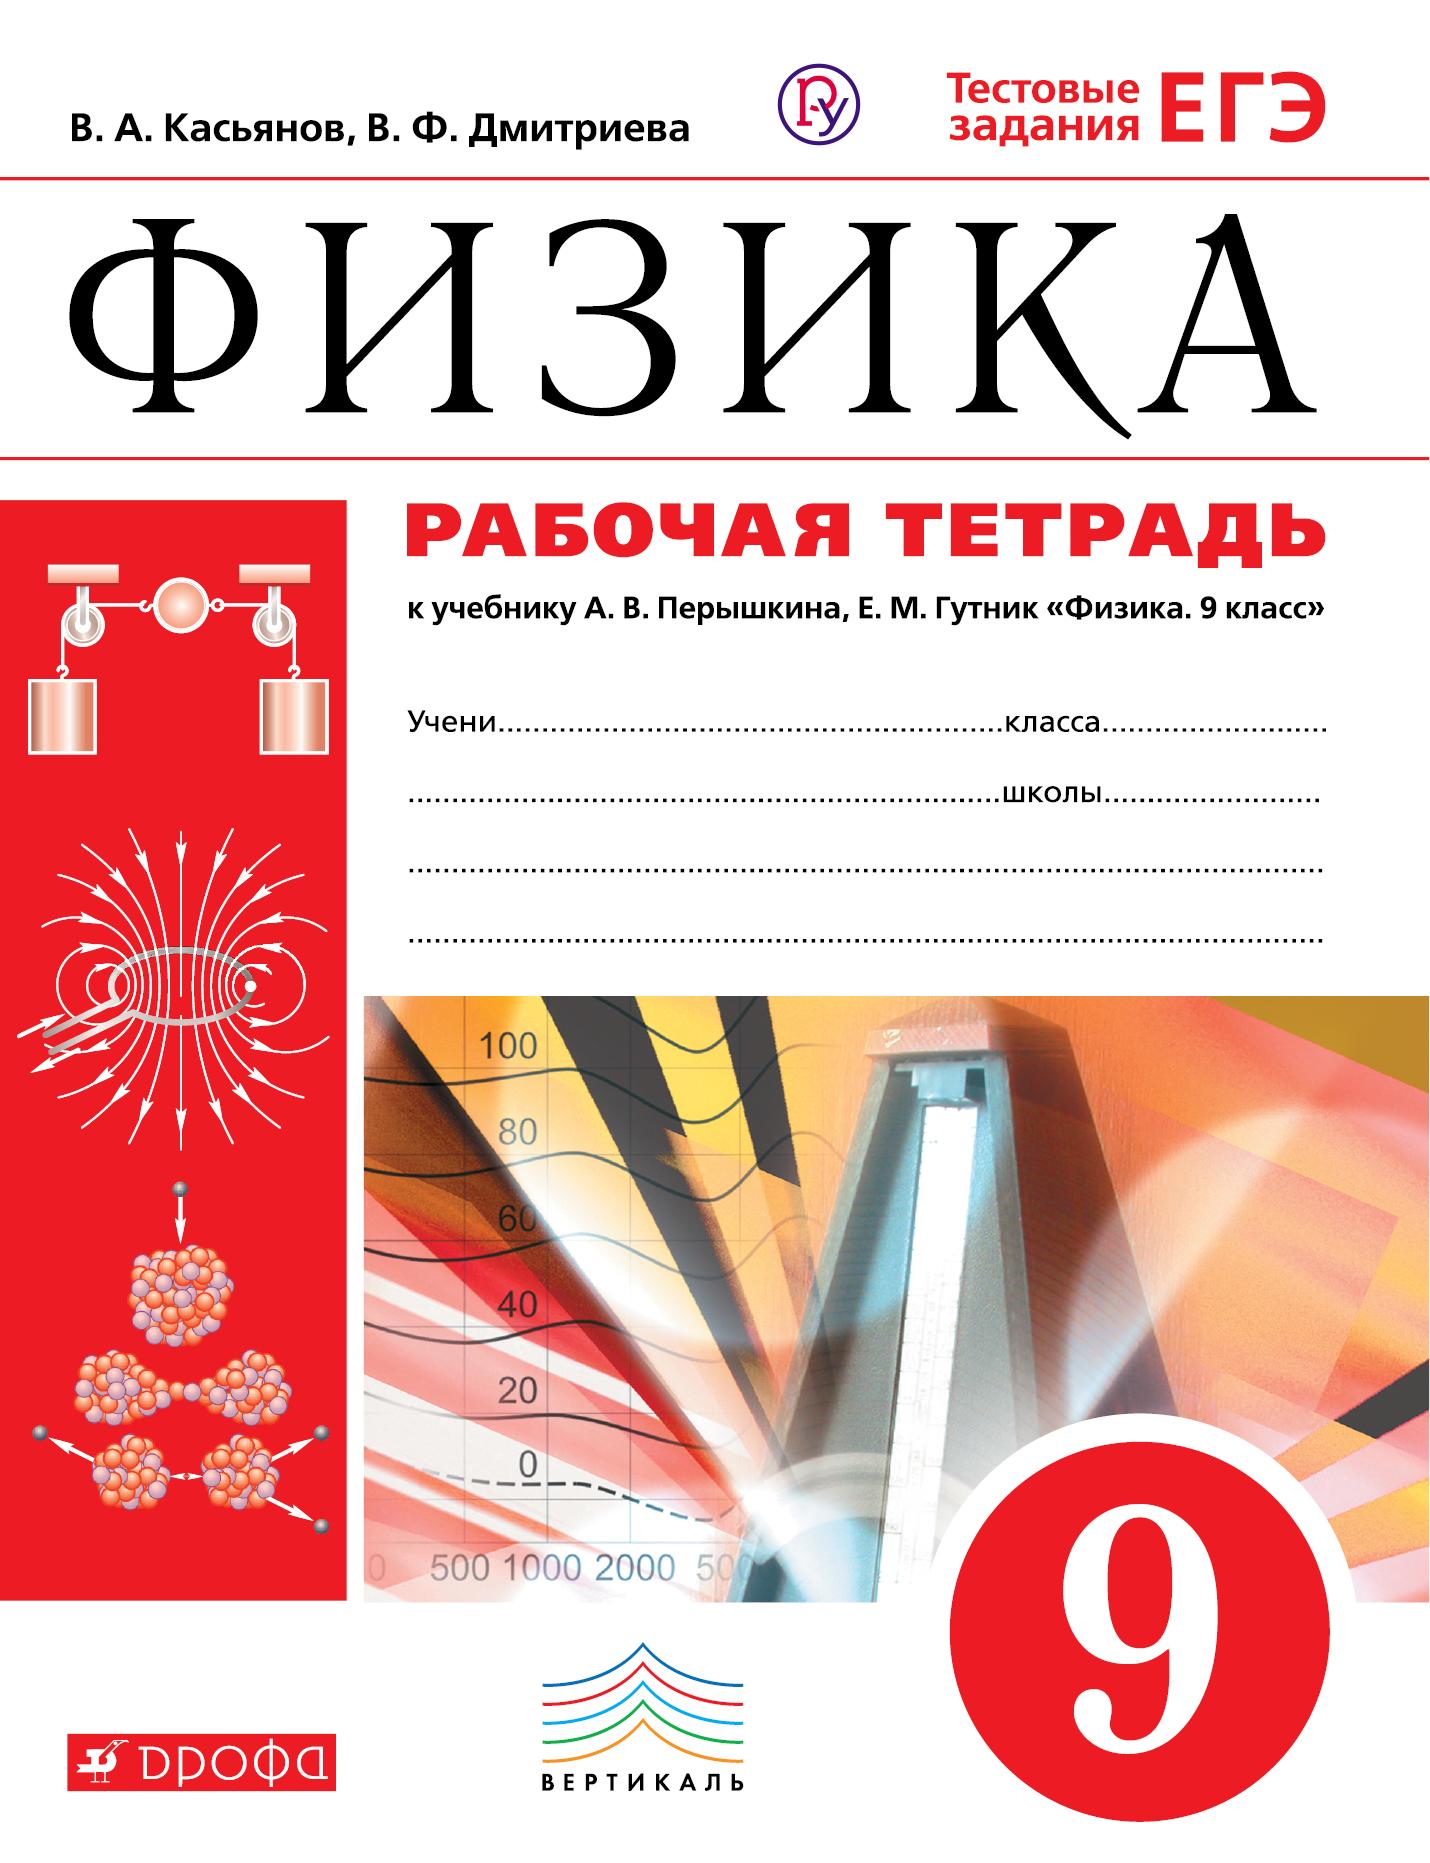 Касьянов В.А., Дмитриева В.Ф. Физика. 9 класс. Рабочая тетрадь. физика 9 класс